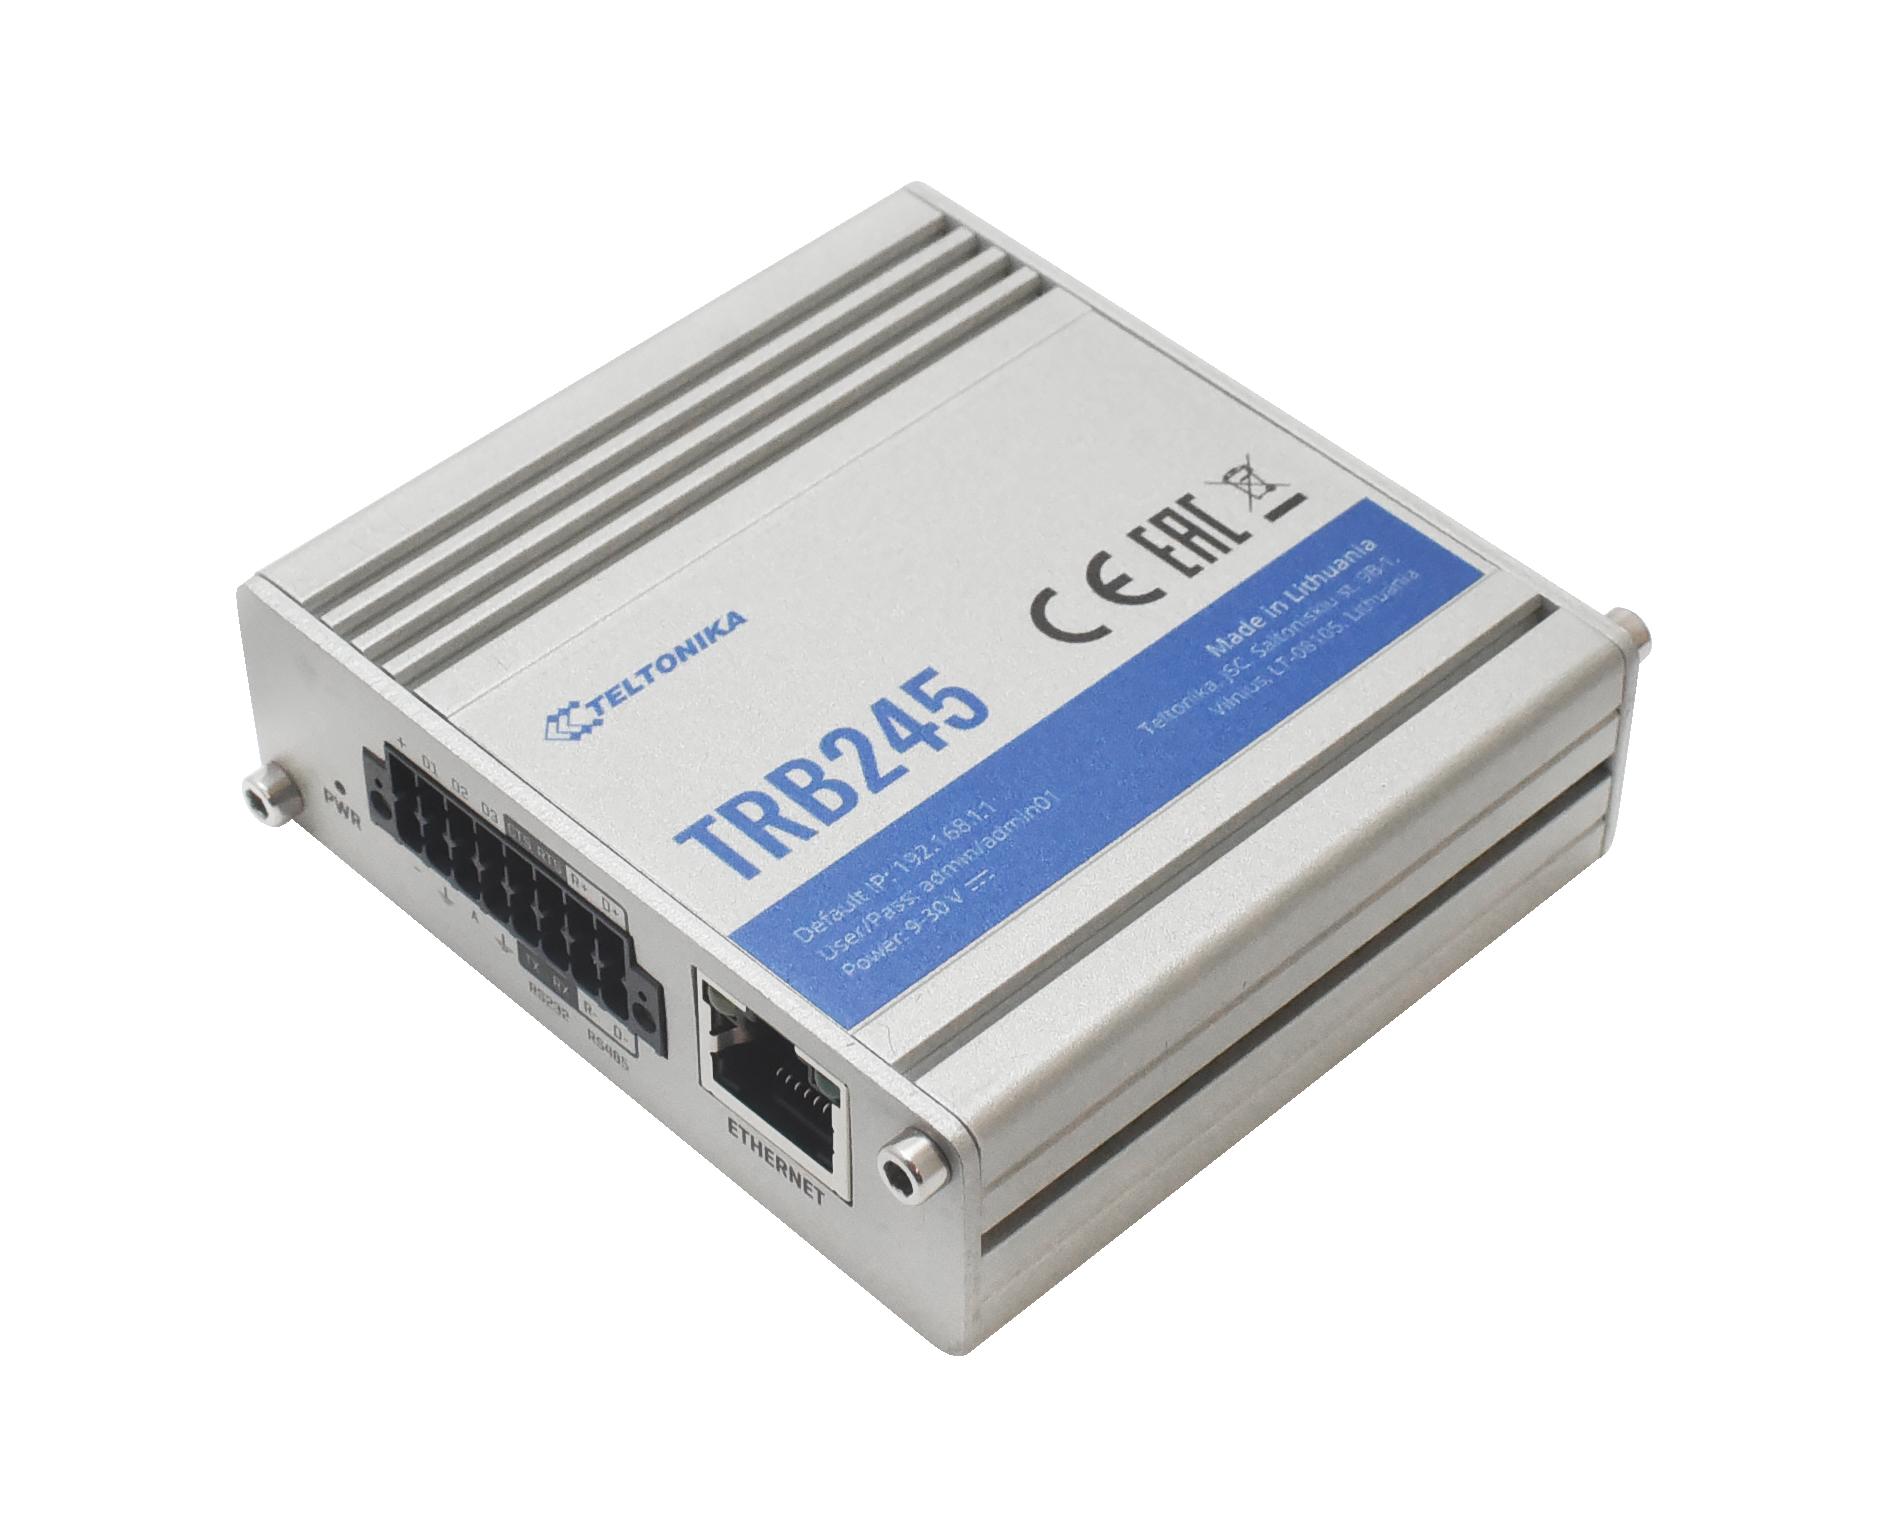 TRB245 – Gateway LTE CAT4 Ethernet, RS232/485/422, DIO y GPS